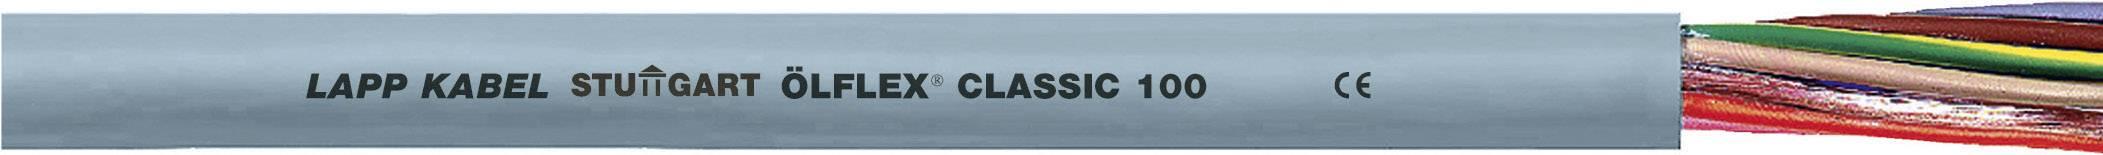 Kabel LappKabel Ölflex CLASSIC 100 4G2,5 (00100883), PVC, 10,7 mm, 750 V, šedá, 100 m